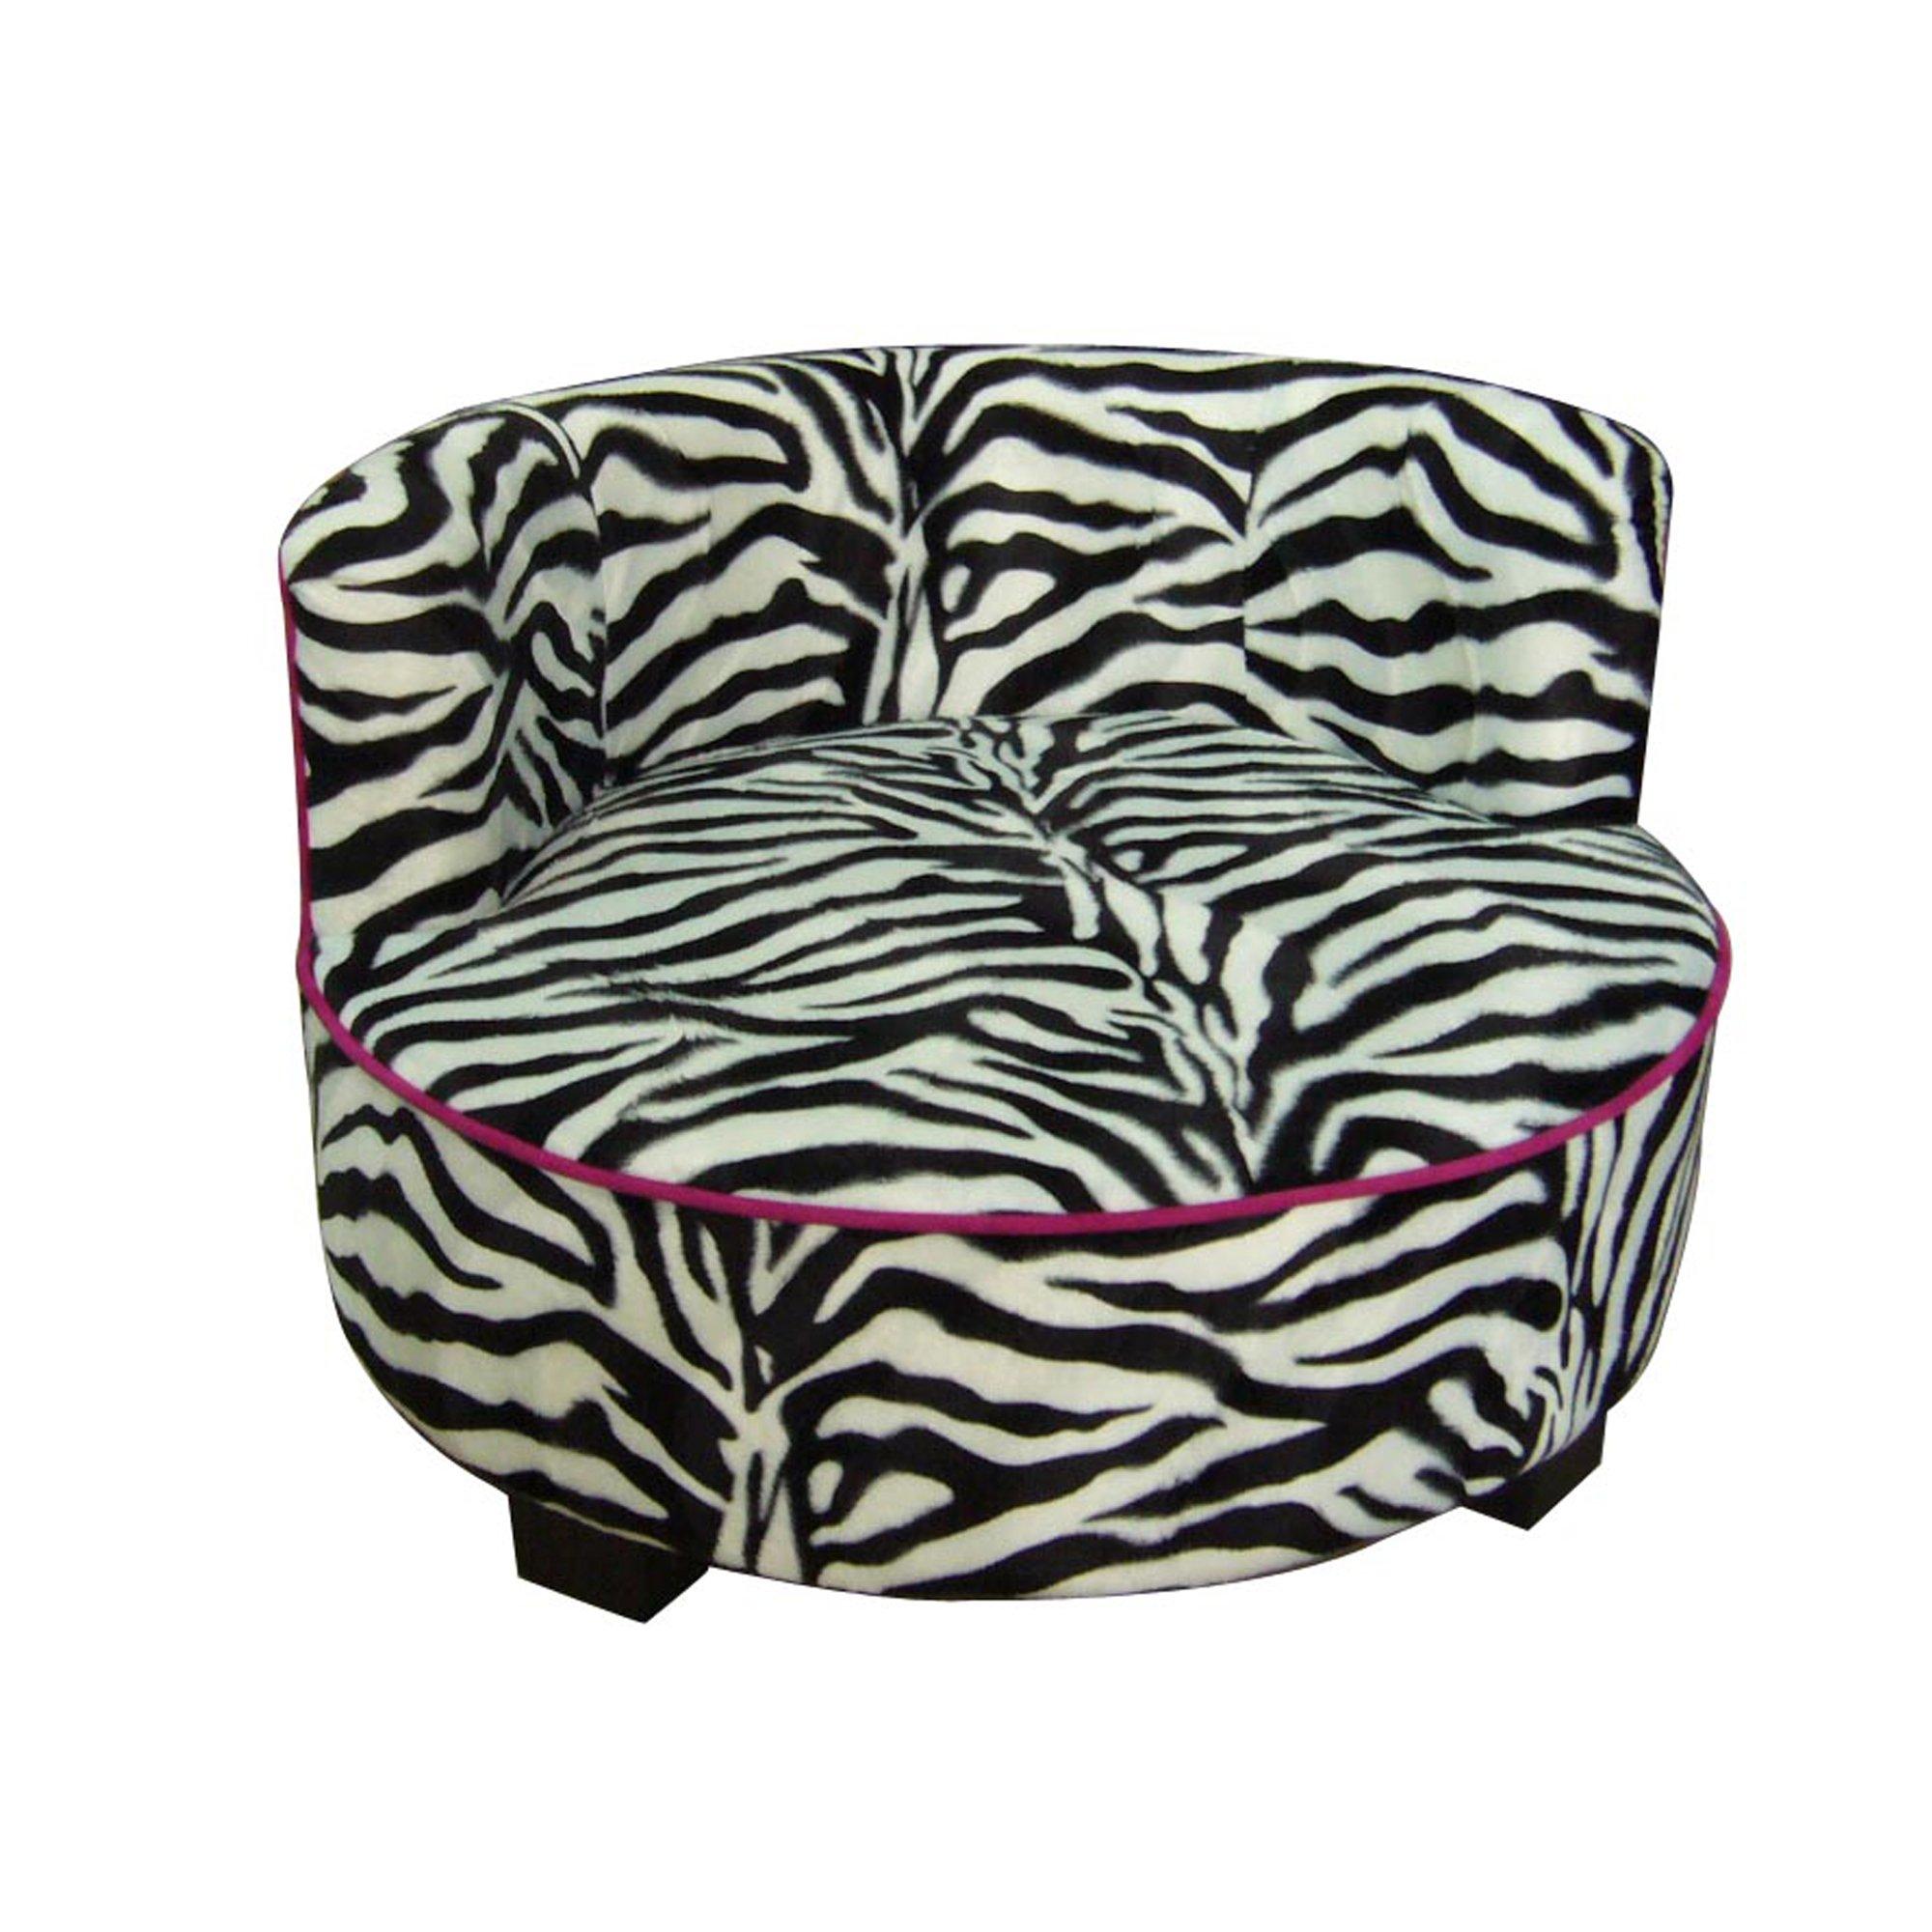 Ore International Round Zebra Print Upholstered Pet Sofa Bed, 15.5''